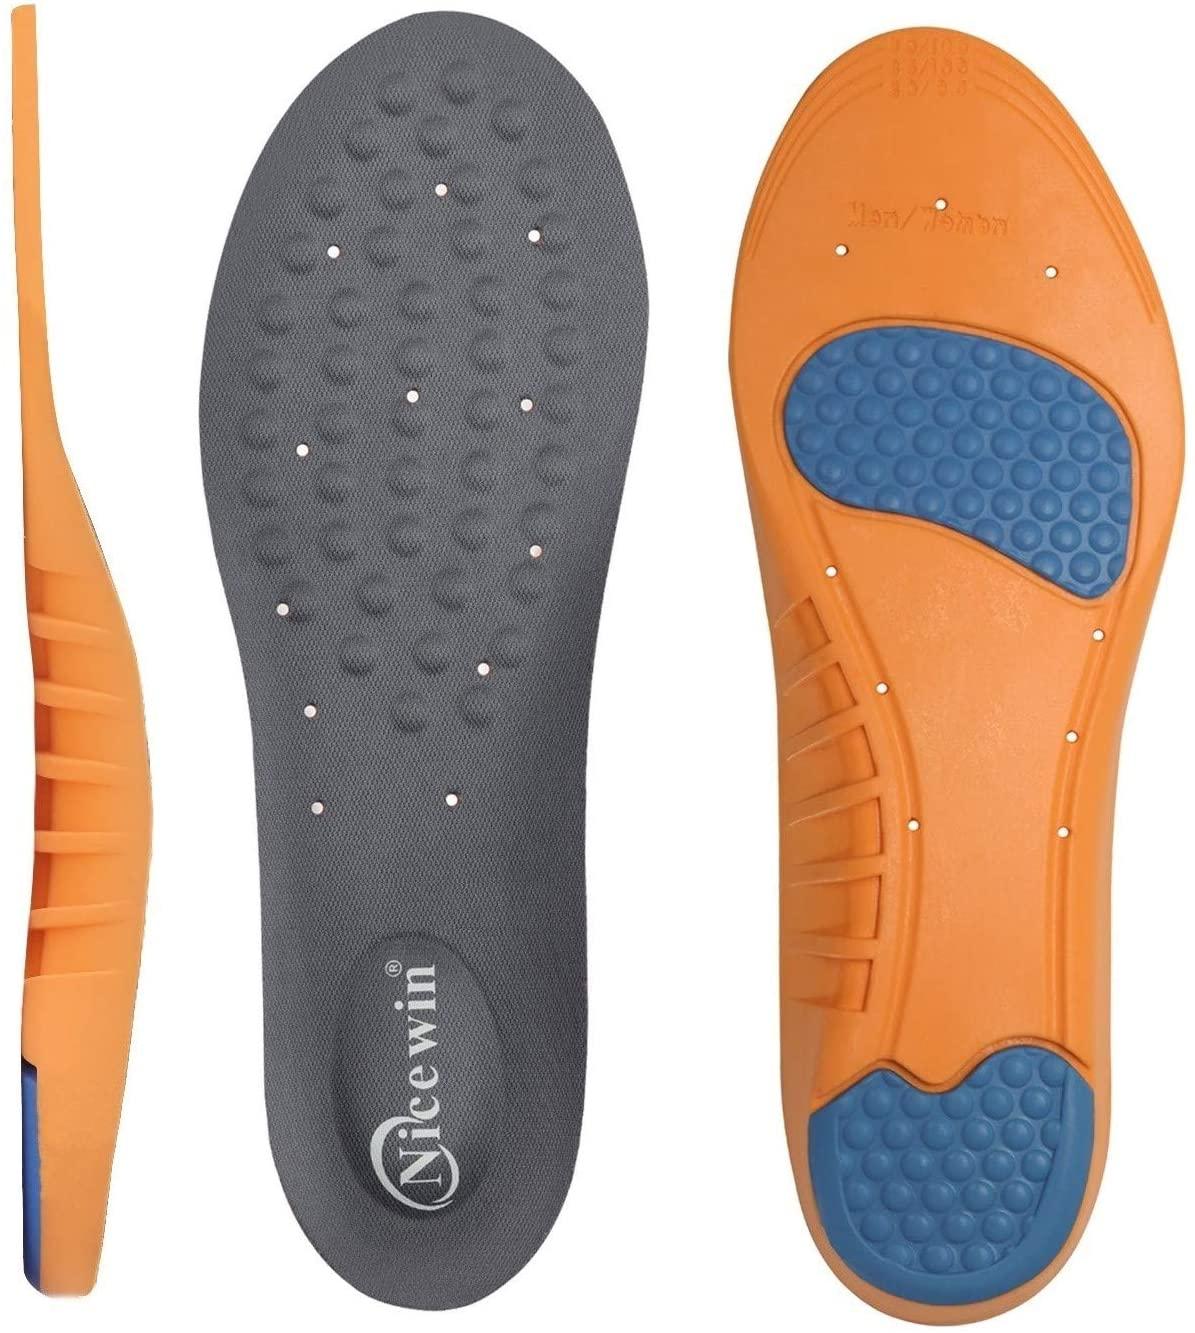 Arch Support Shoe Insoles for Men Women Work Boot Plantar Fasciitis Foot Pain Relief Shin Splint